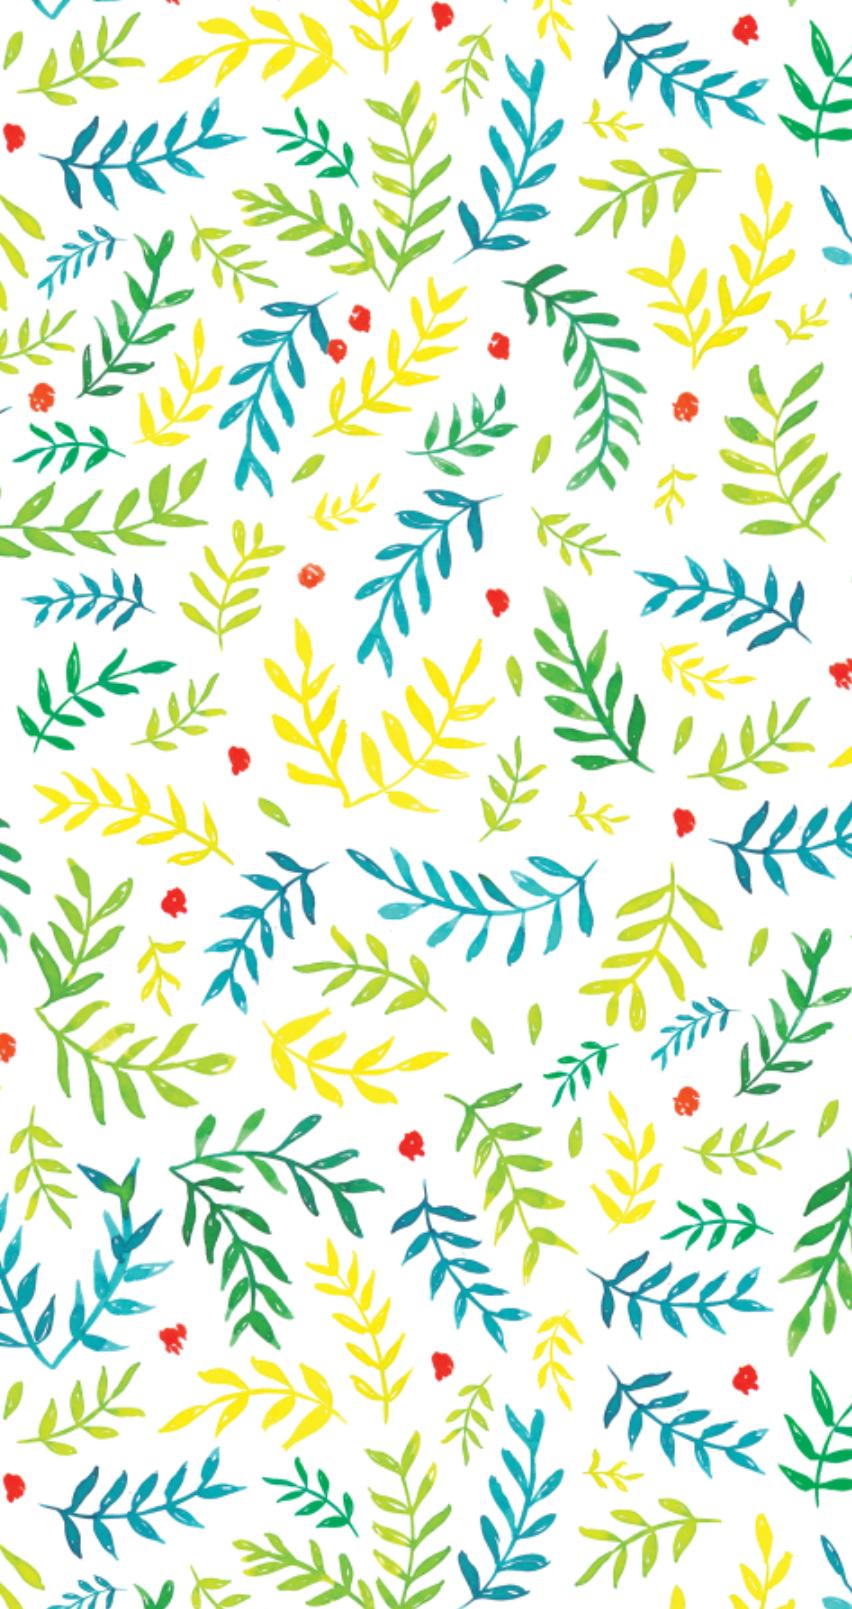 Most Inspiring Wallpaper Home Screen Watercolor - Nathalie-Ouederni-Watercolor-Strawberries-iphone6+copy  Image_719624.jpg